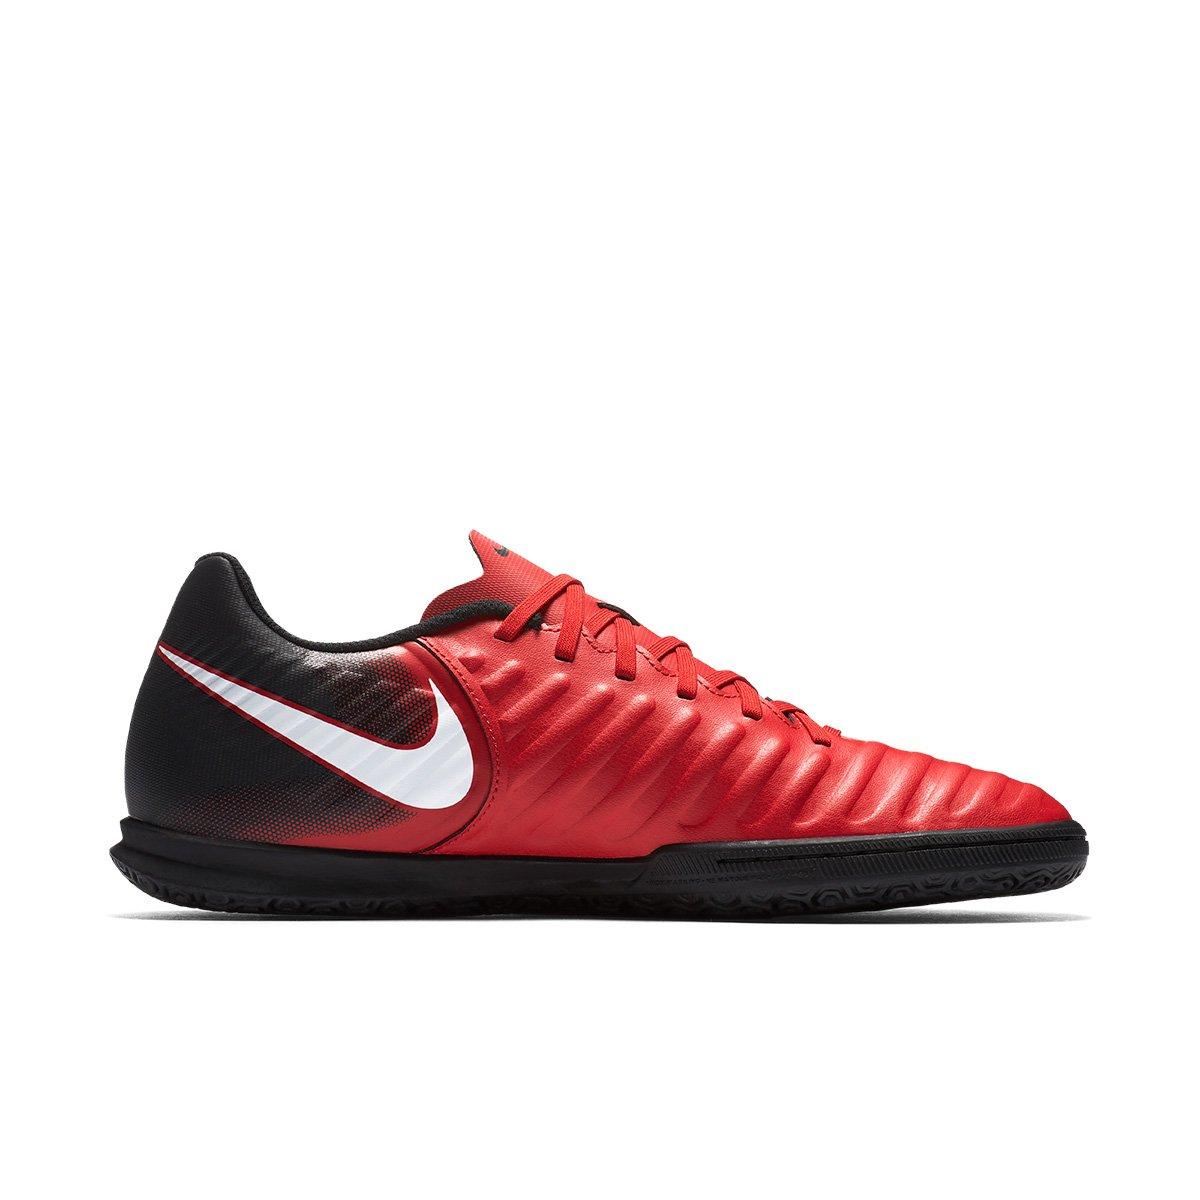 Chuteira Futsal Nike Tiempo Rio 4 IC - Compre Agora  ee8c6d15e1567